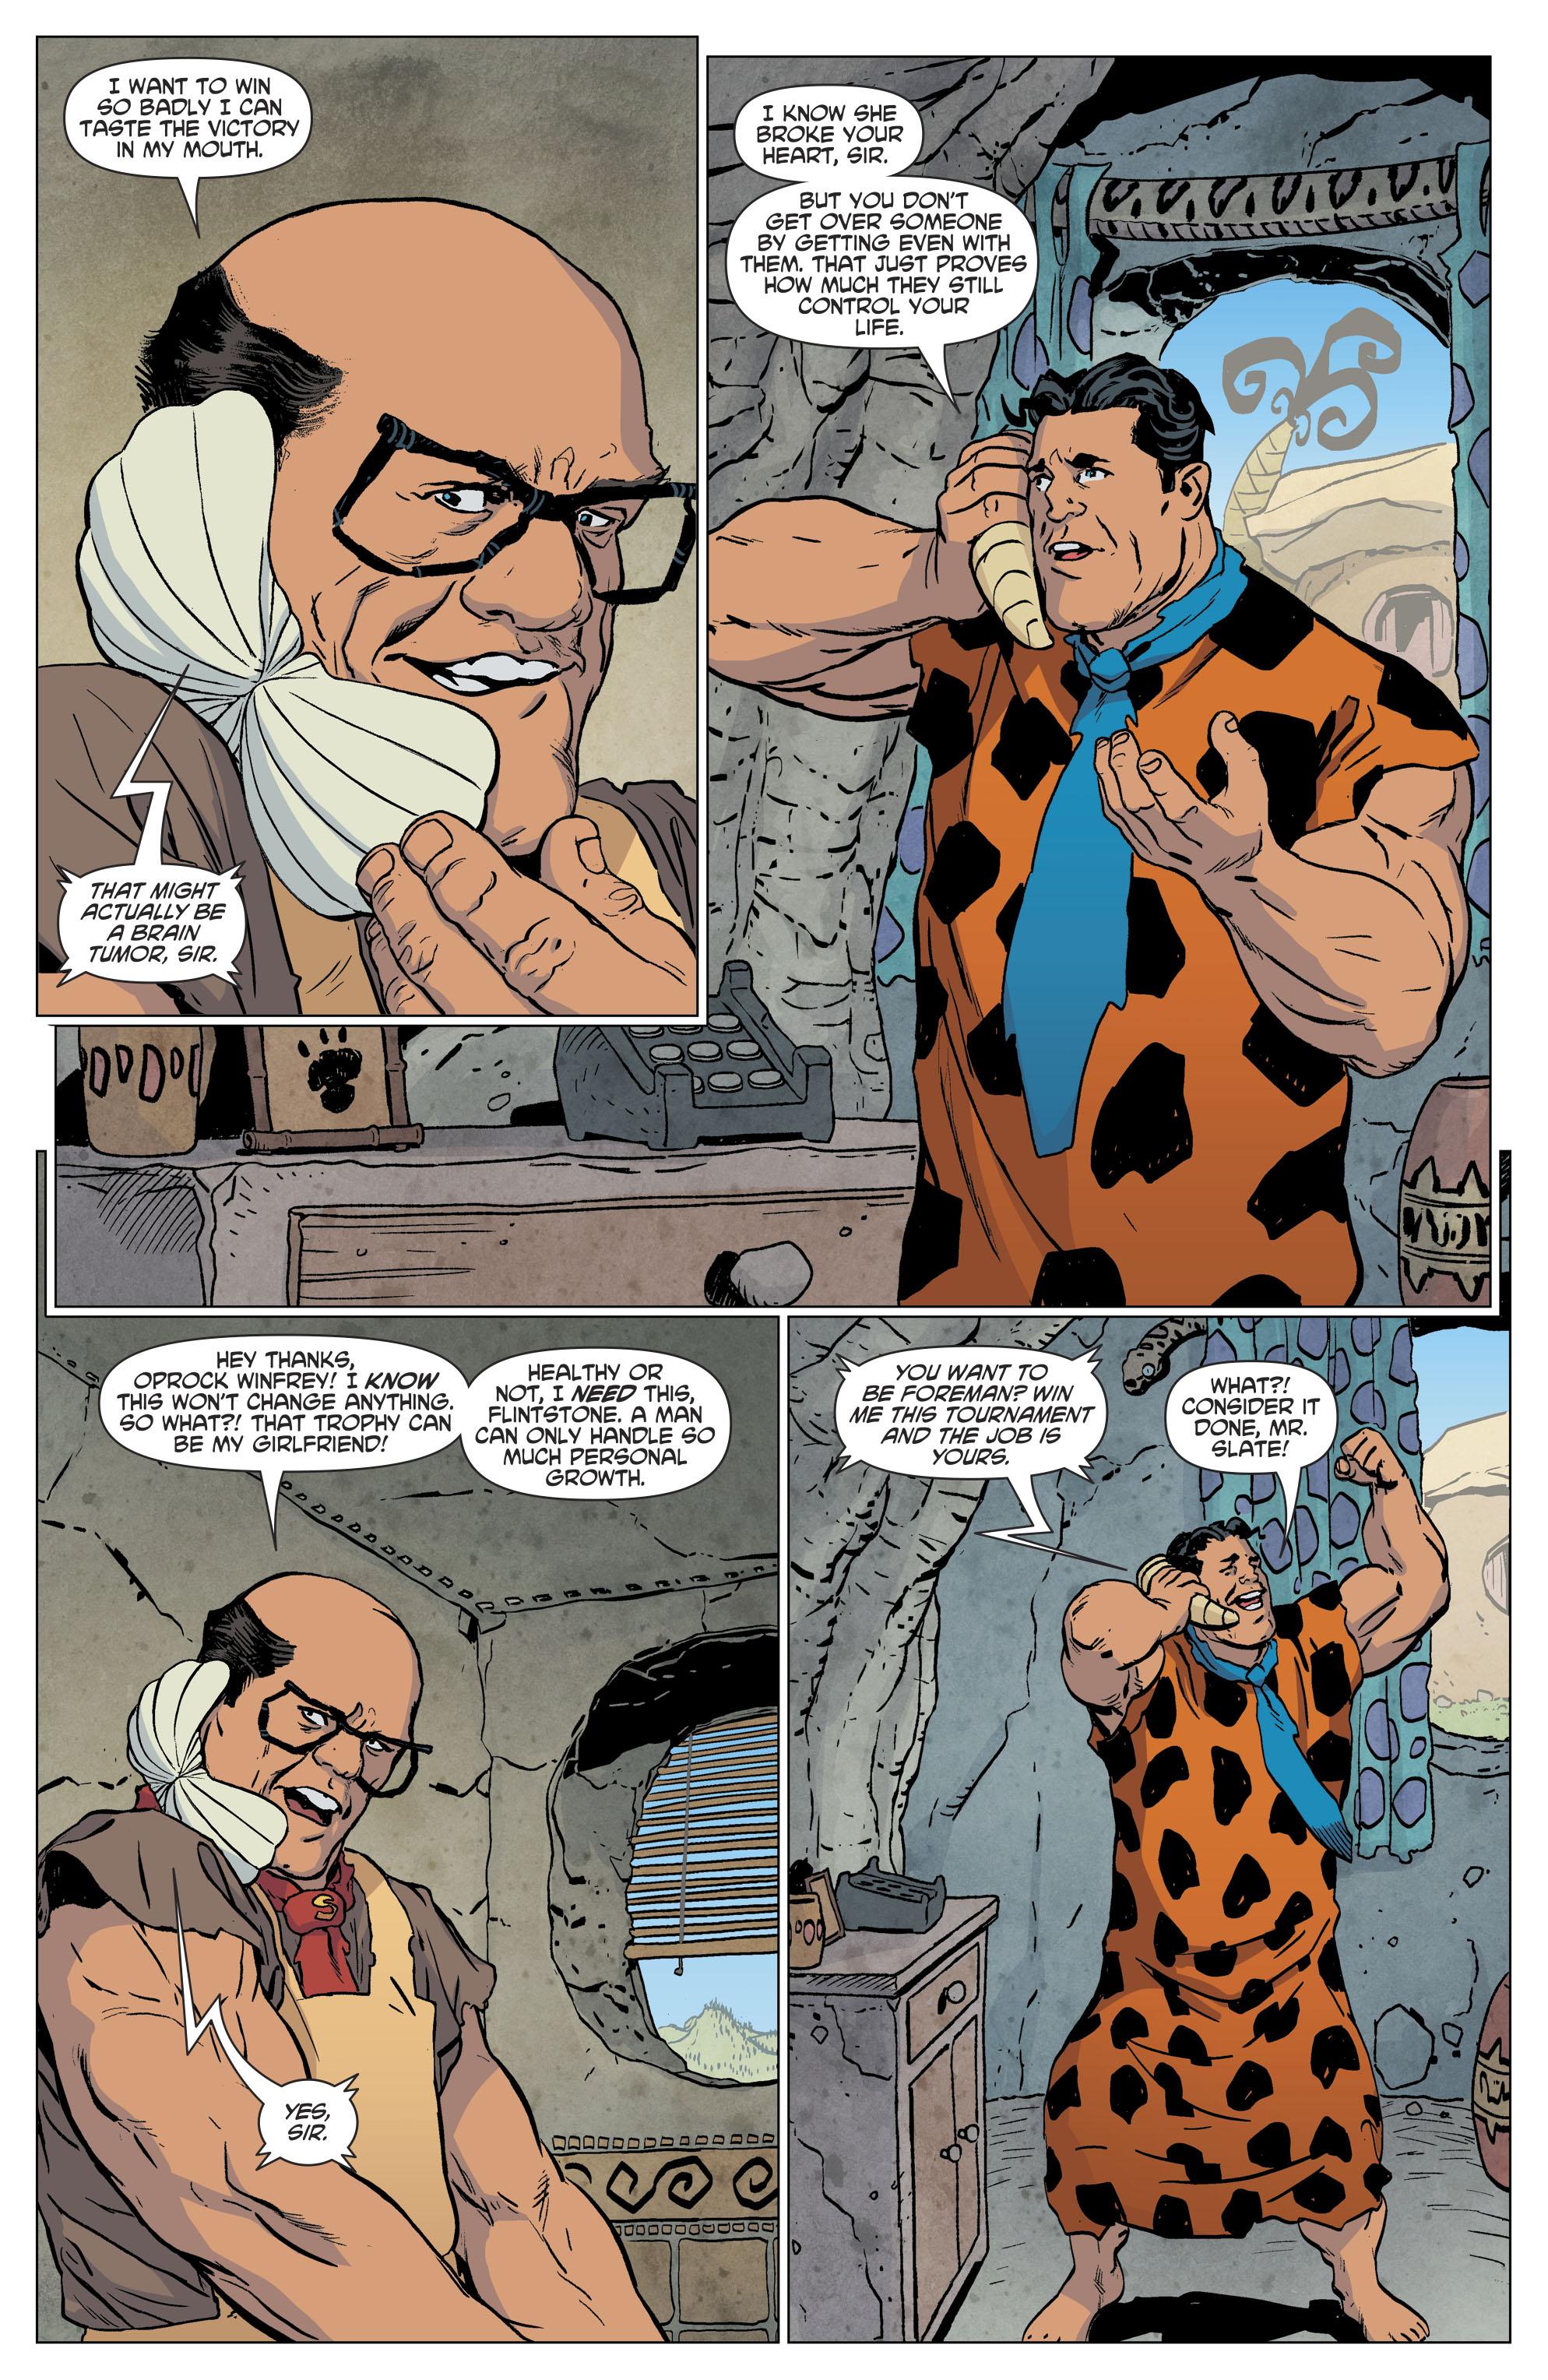 Read online The Flintstones comic -  Issue #12 - 9